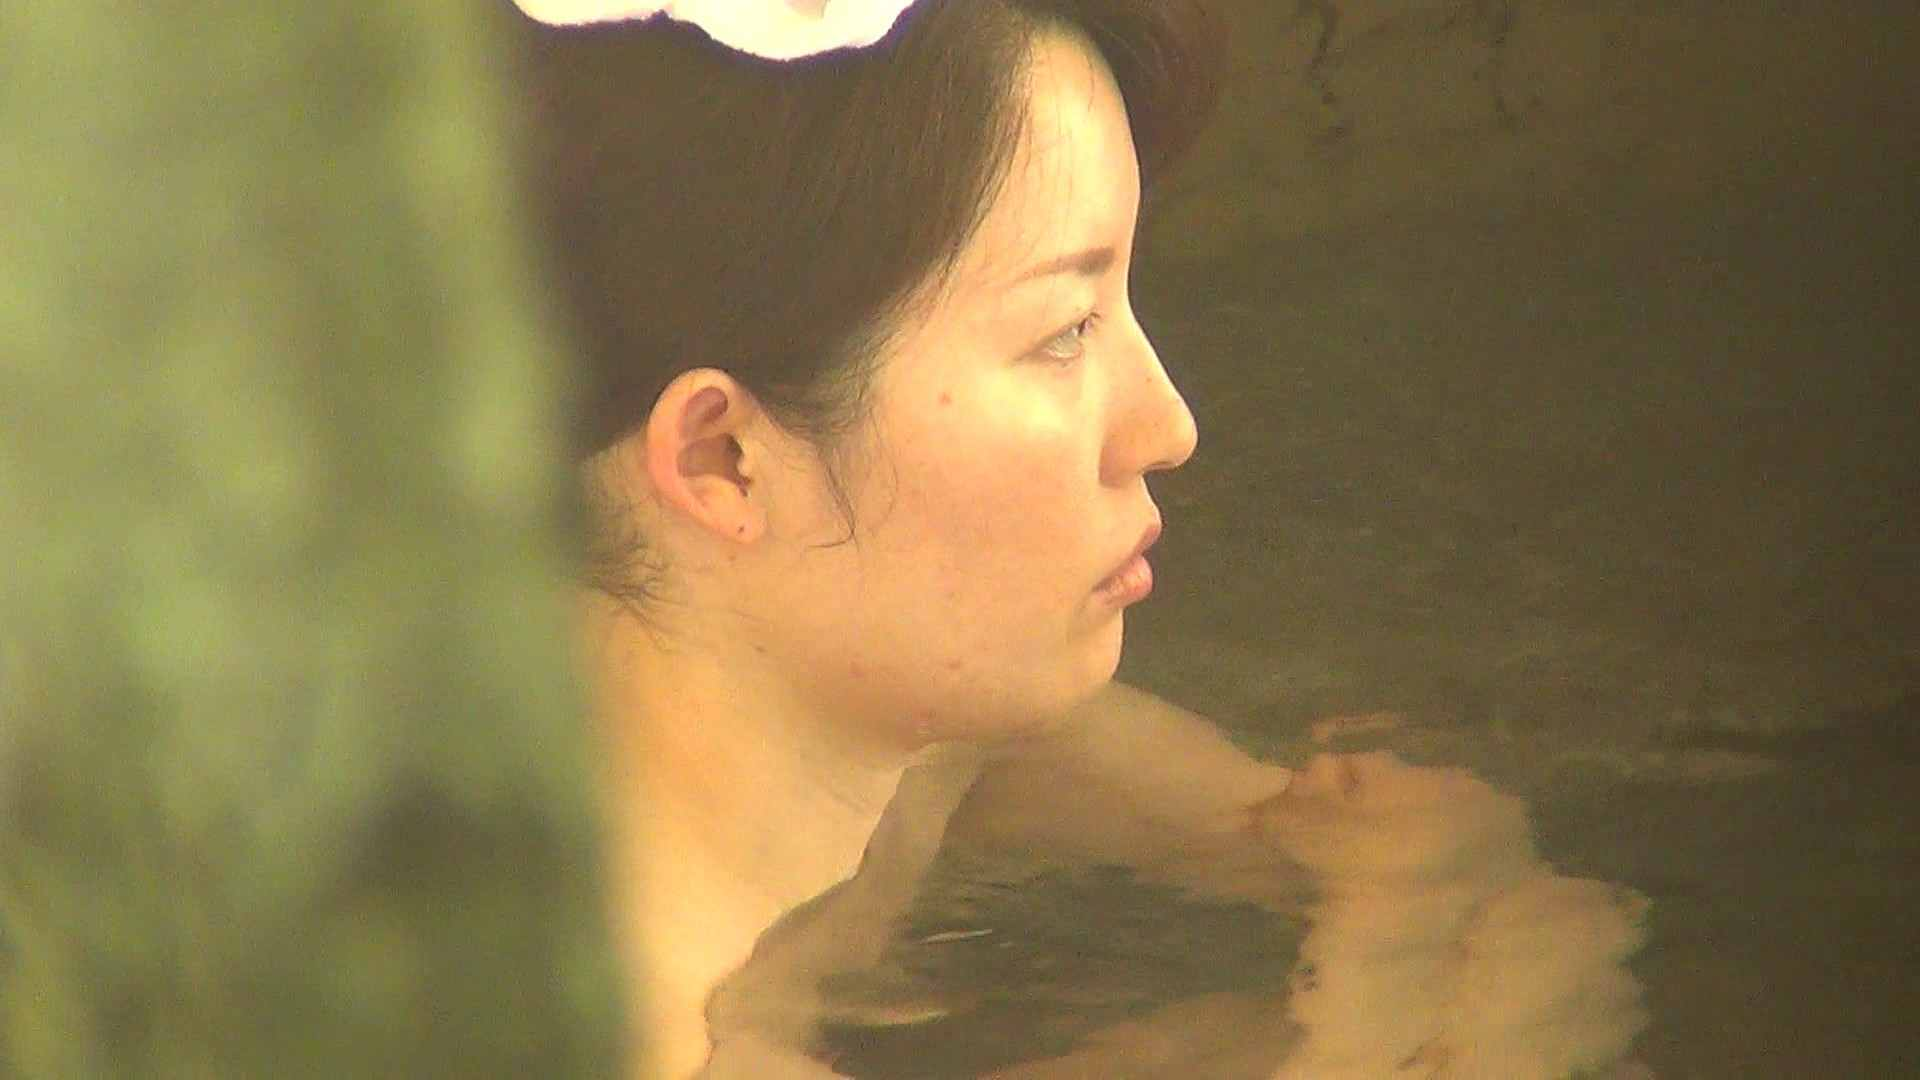 Aquaな露天風呂Vol.301 OLのエロ生活 すけべAV動画紹介 112連発 98